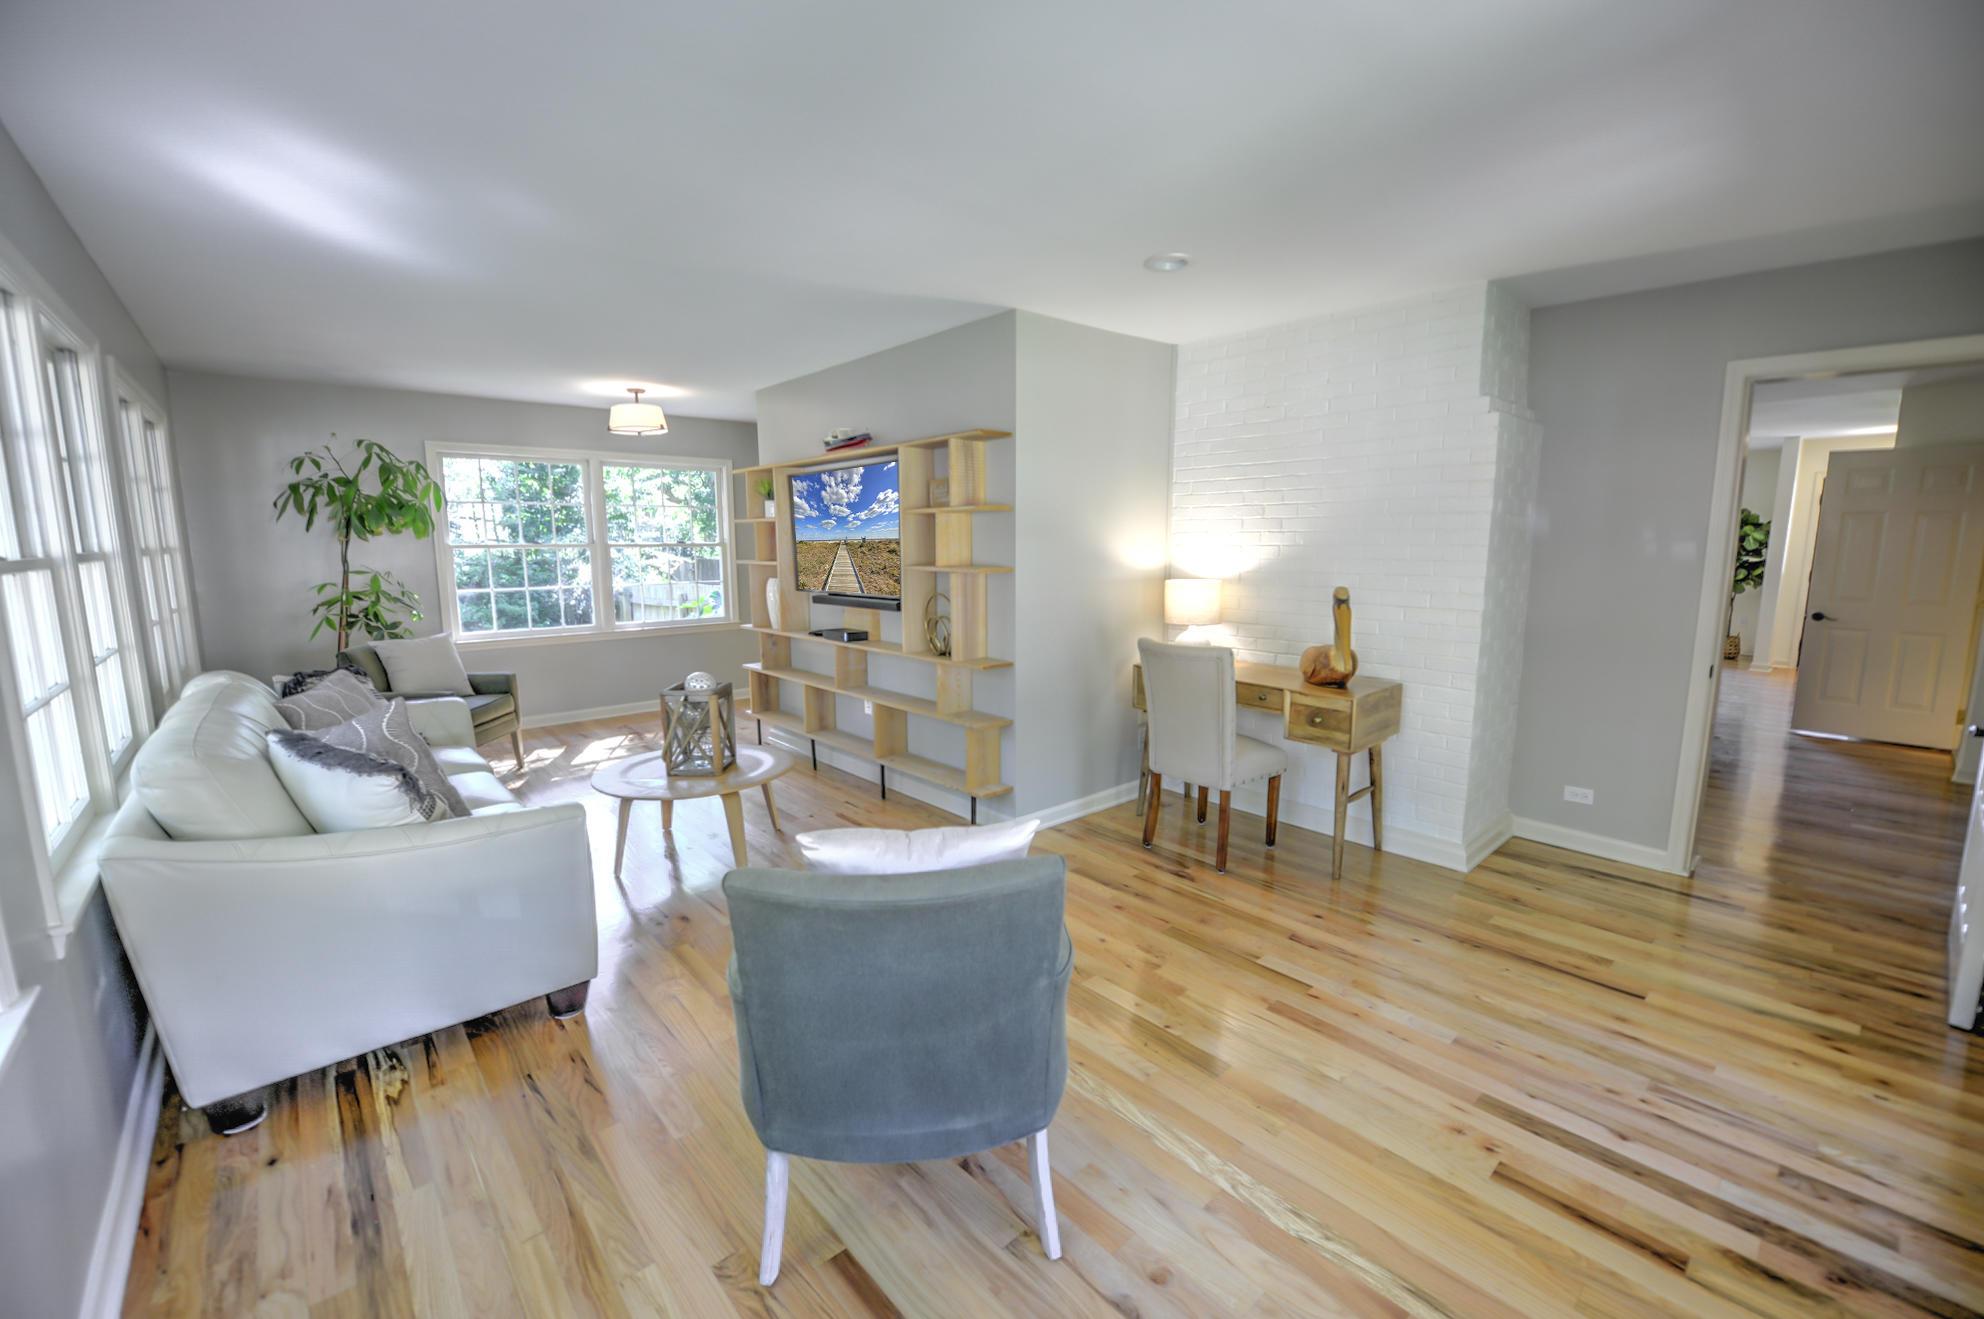 Shemwood II Homes For Sale - 1017 Jack Snipe, Mount Pleasant, SC - 10